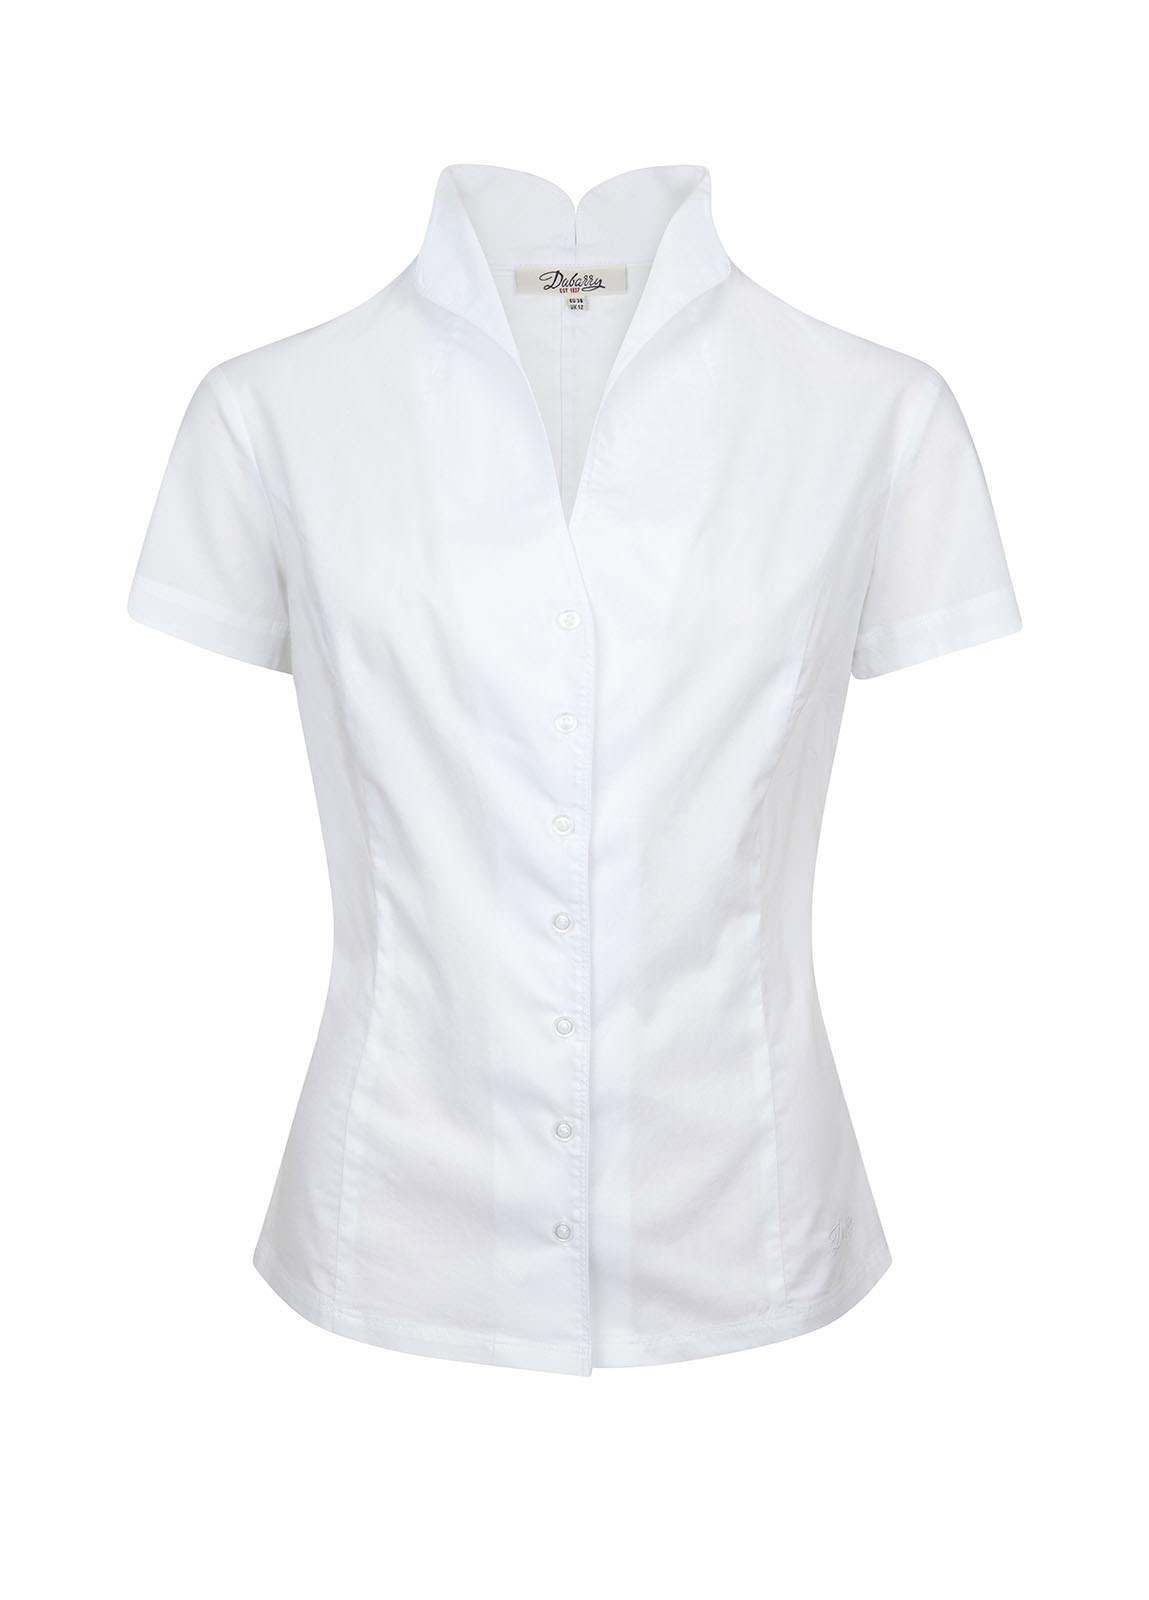 Starflower Short Sleeve Women's Shirt - White